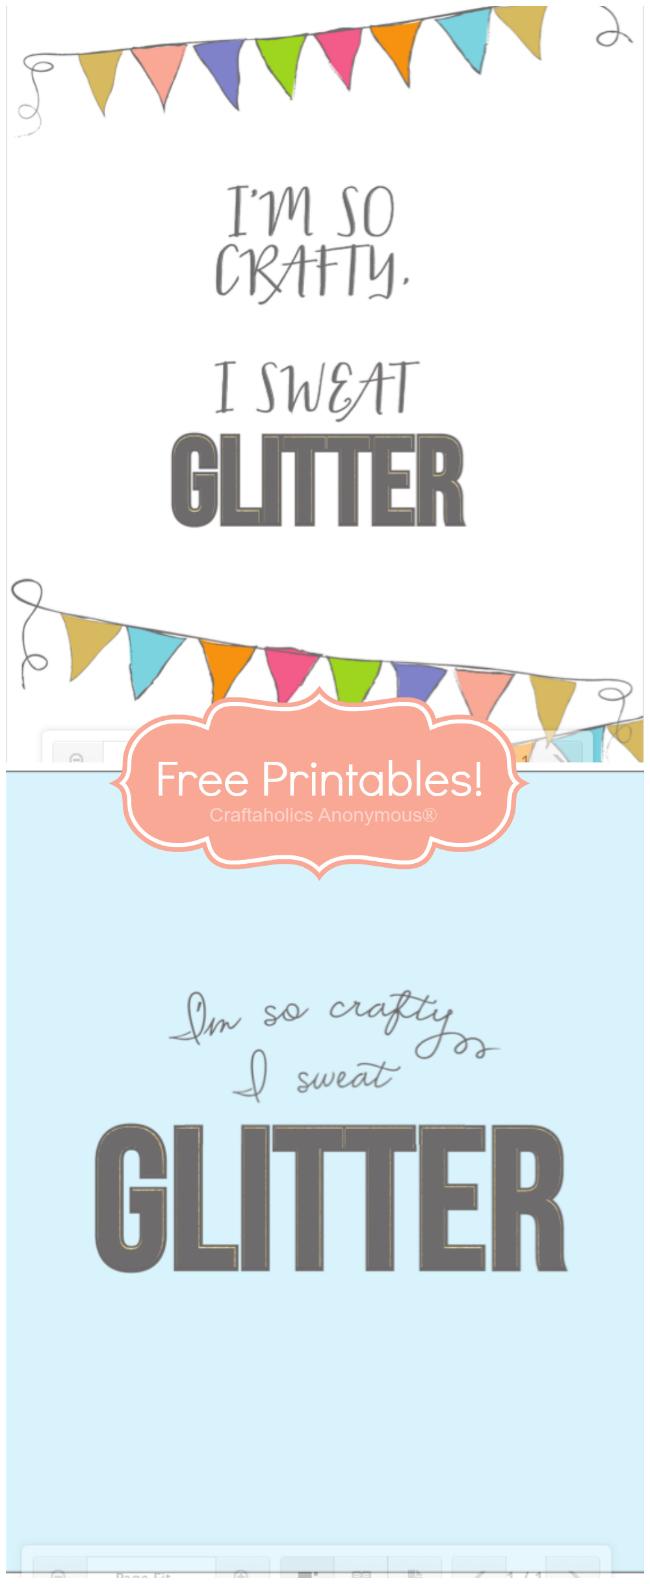 I'm so crafty I sweat glitter printable